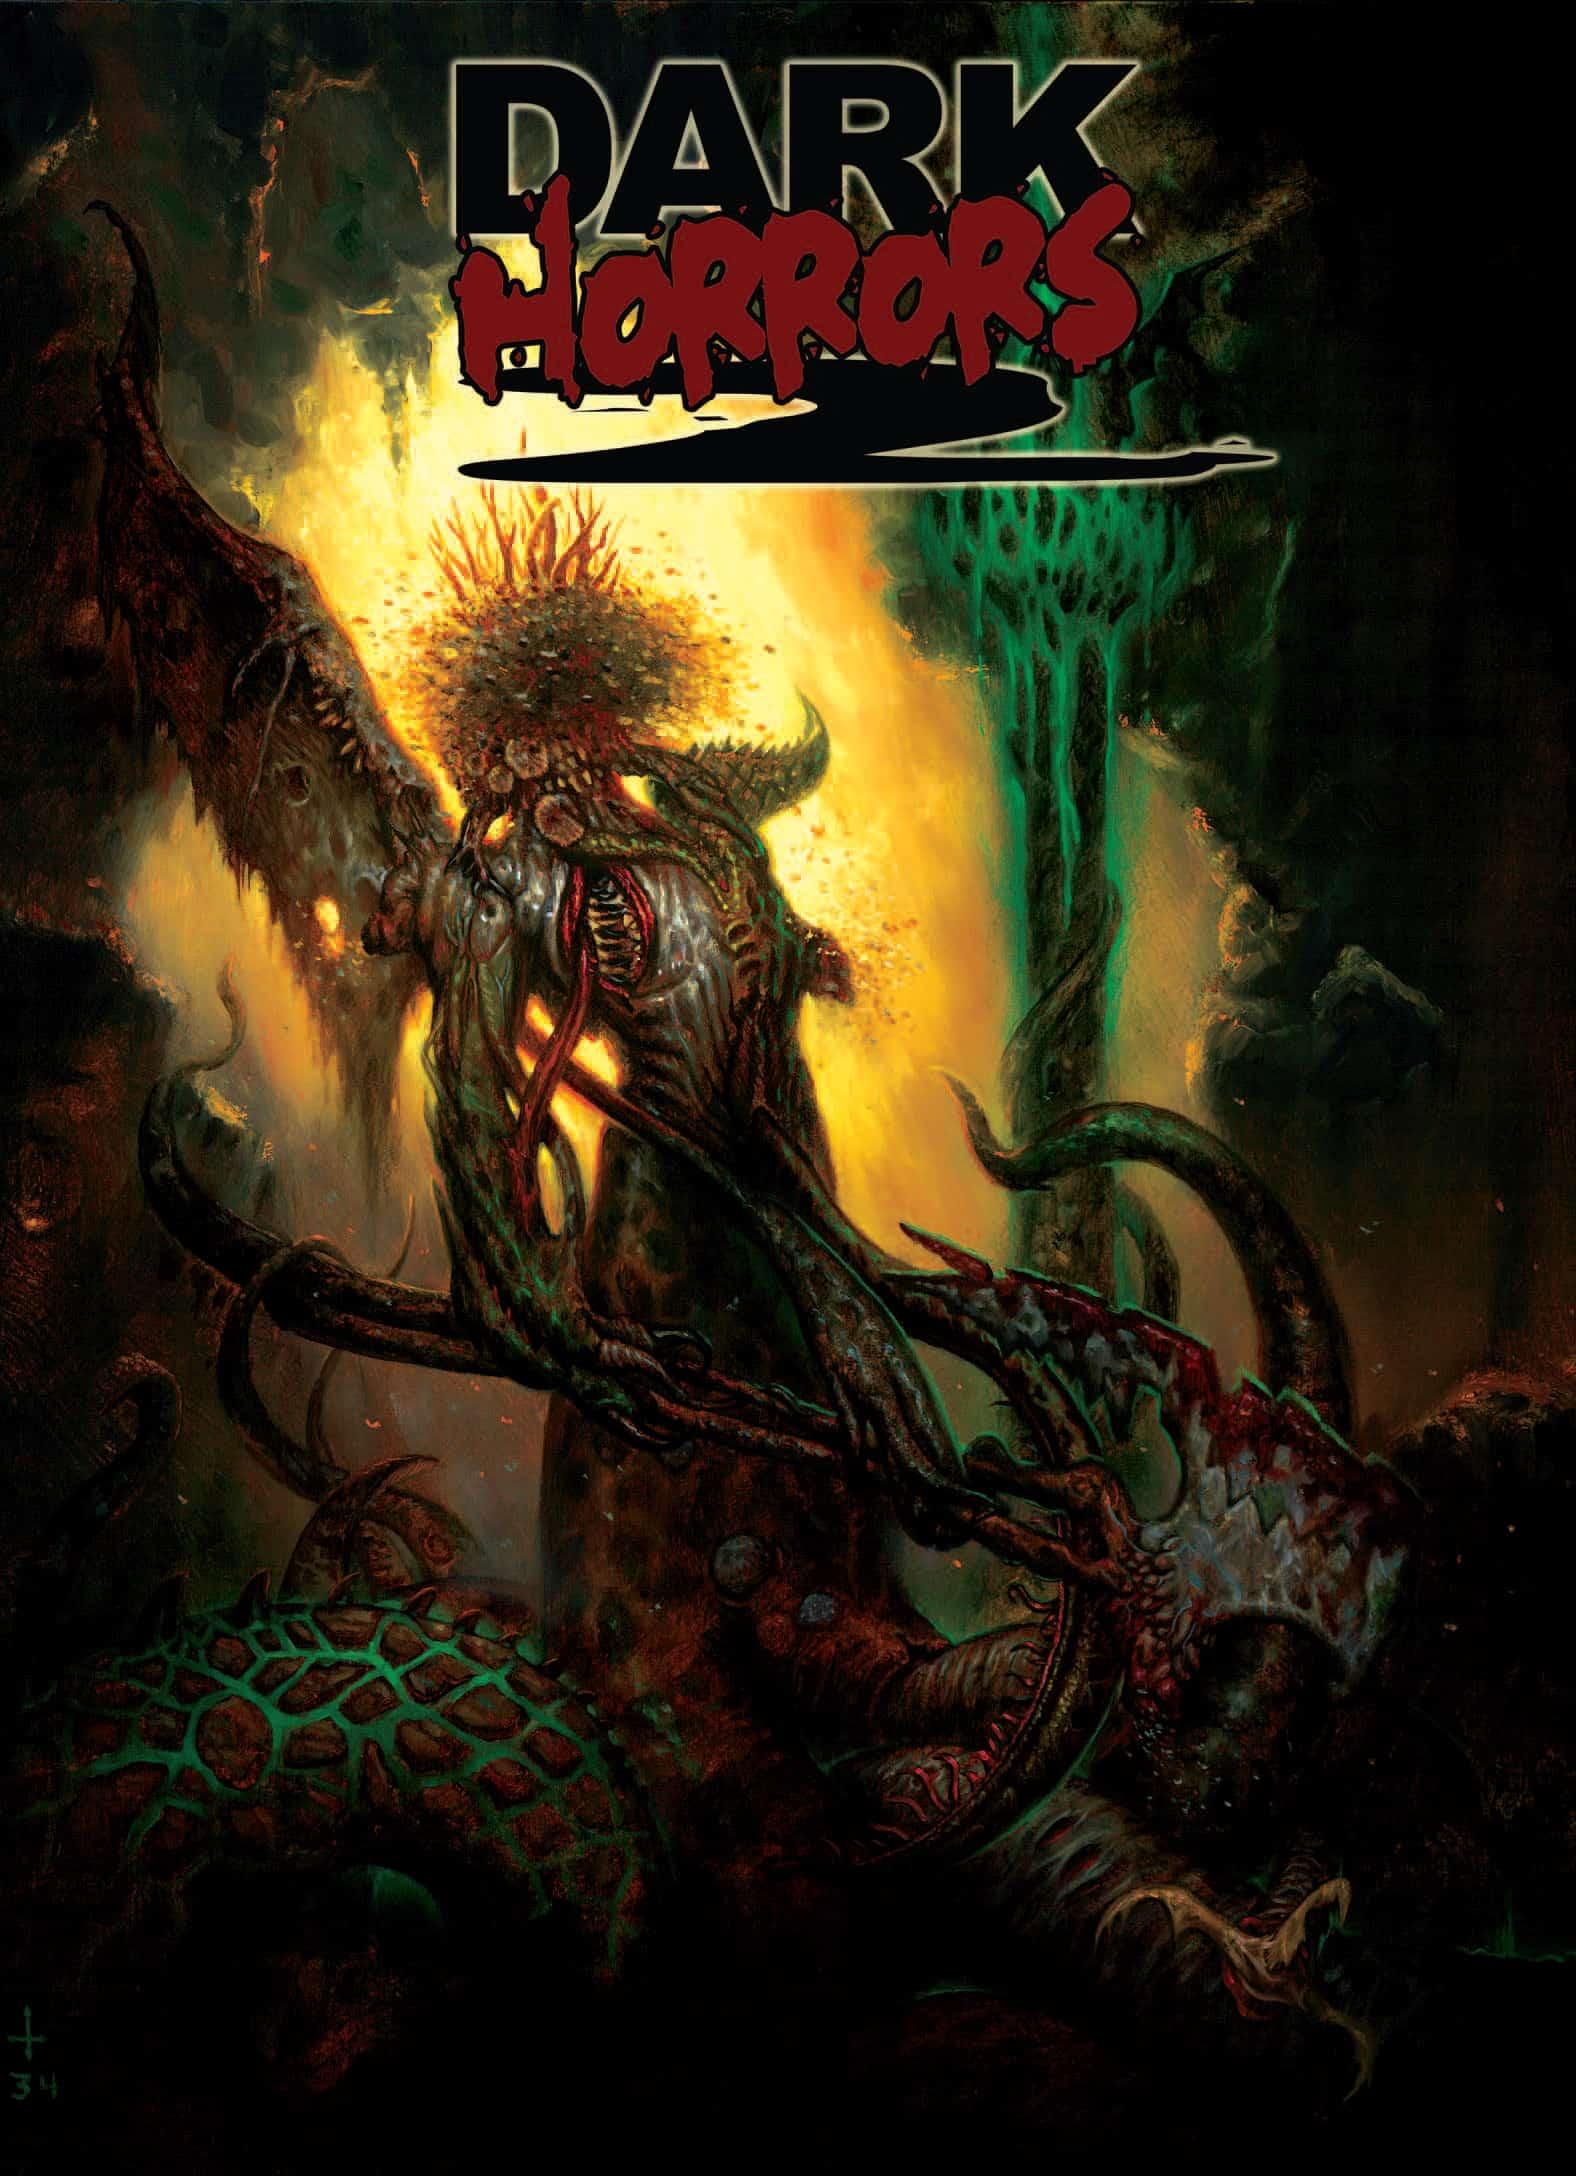 Dark_Horrors_v2-300dpi-1